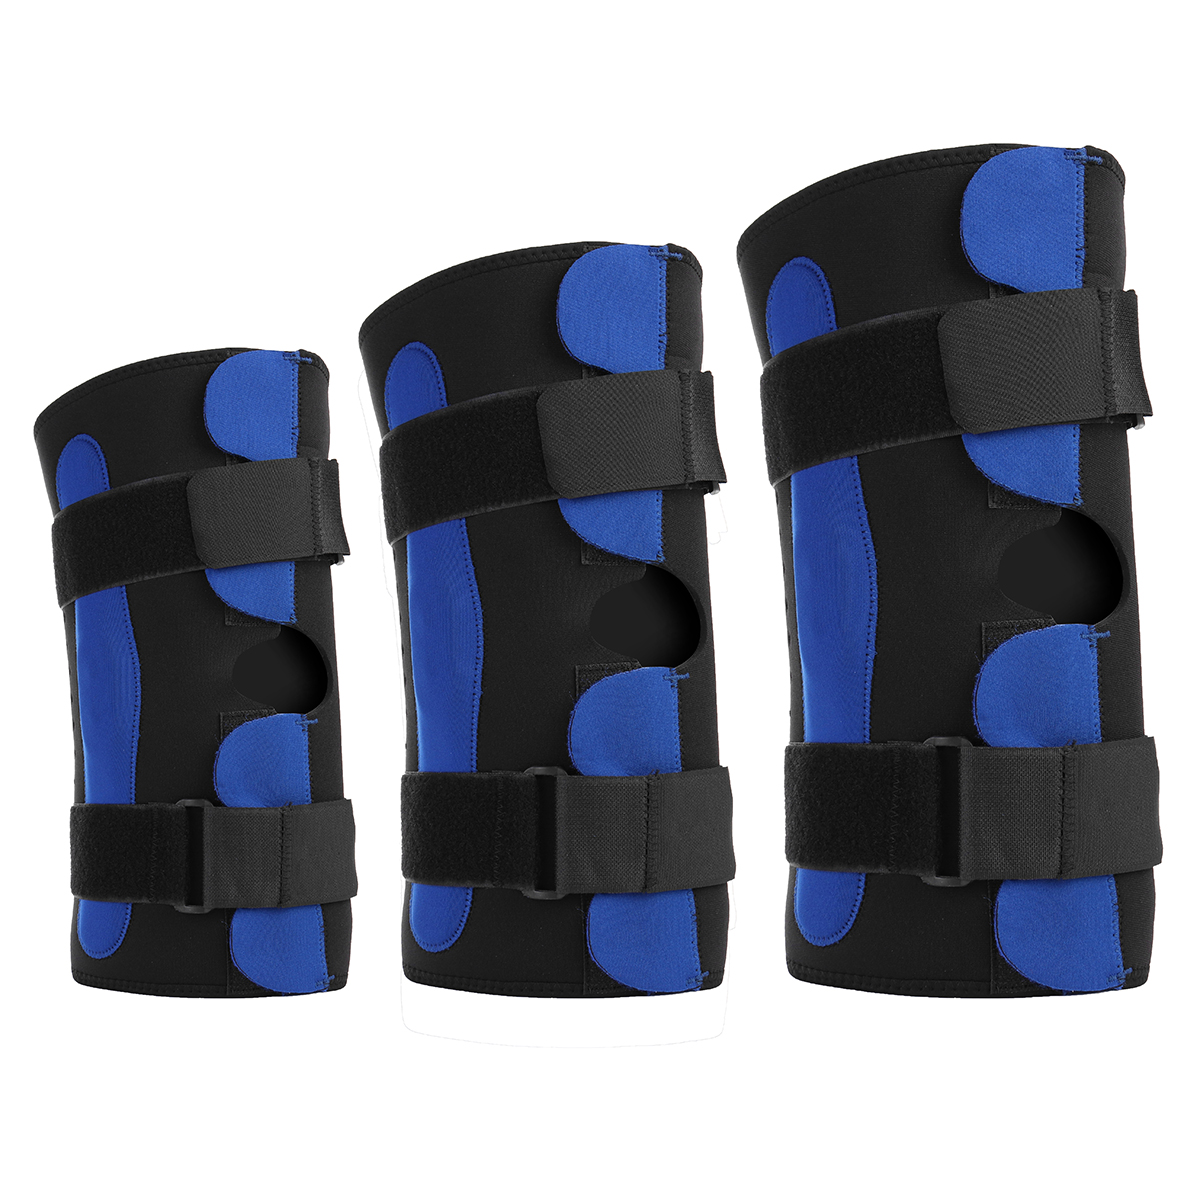 Adjustable Knee Pad Patella Support Brace Sleeve Wrap Cap Stabilizer Portable Sports Knee Protectors